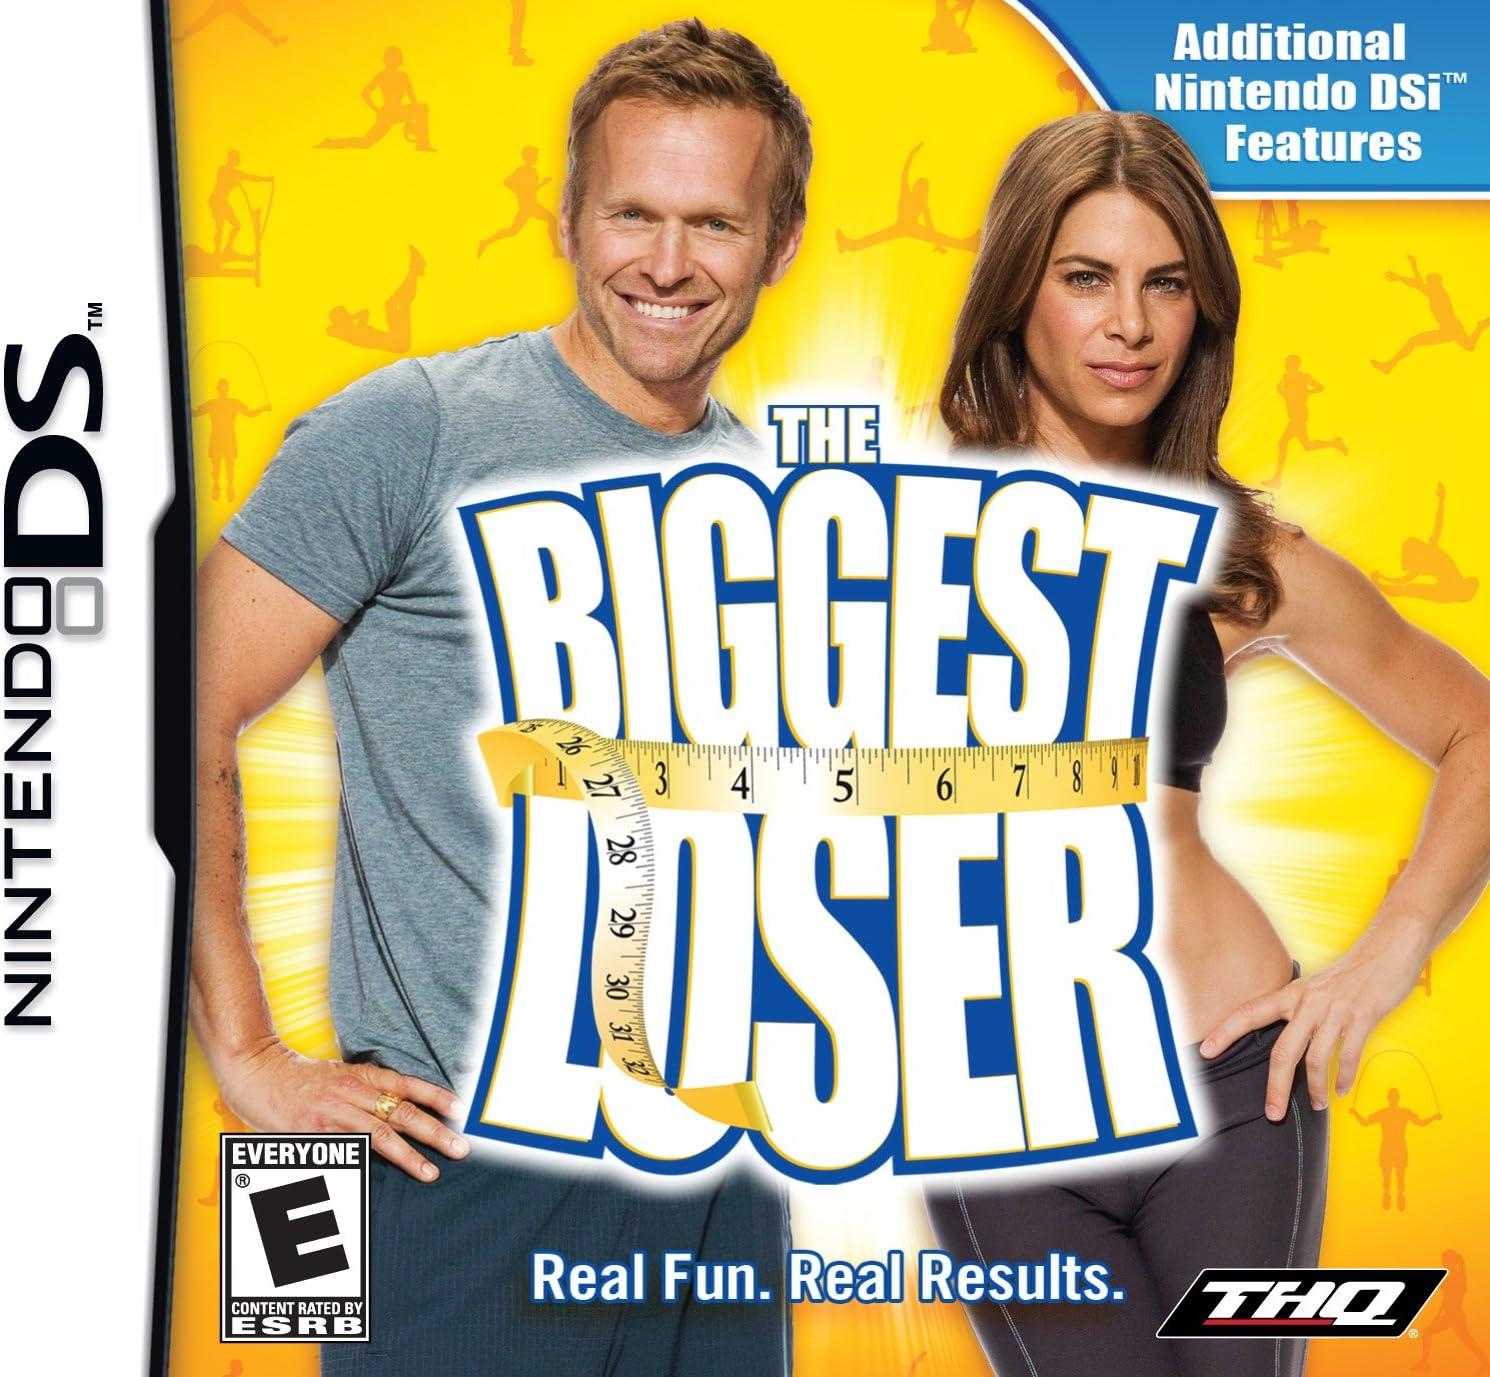 Amazon.com: Biggest Loser - Nintendo Wii: Video Games